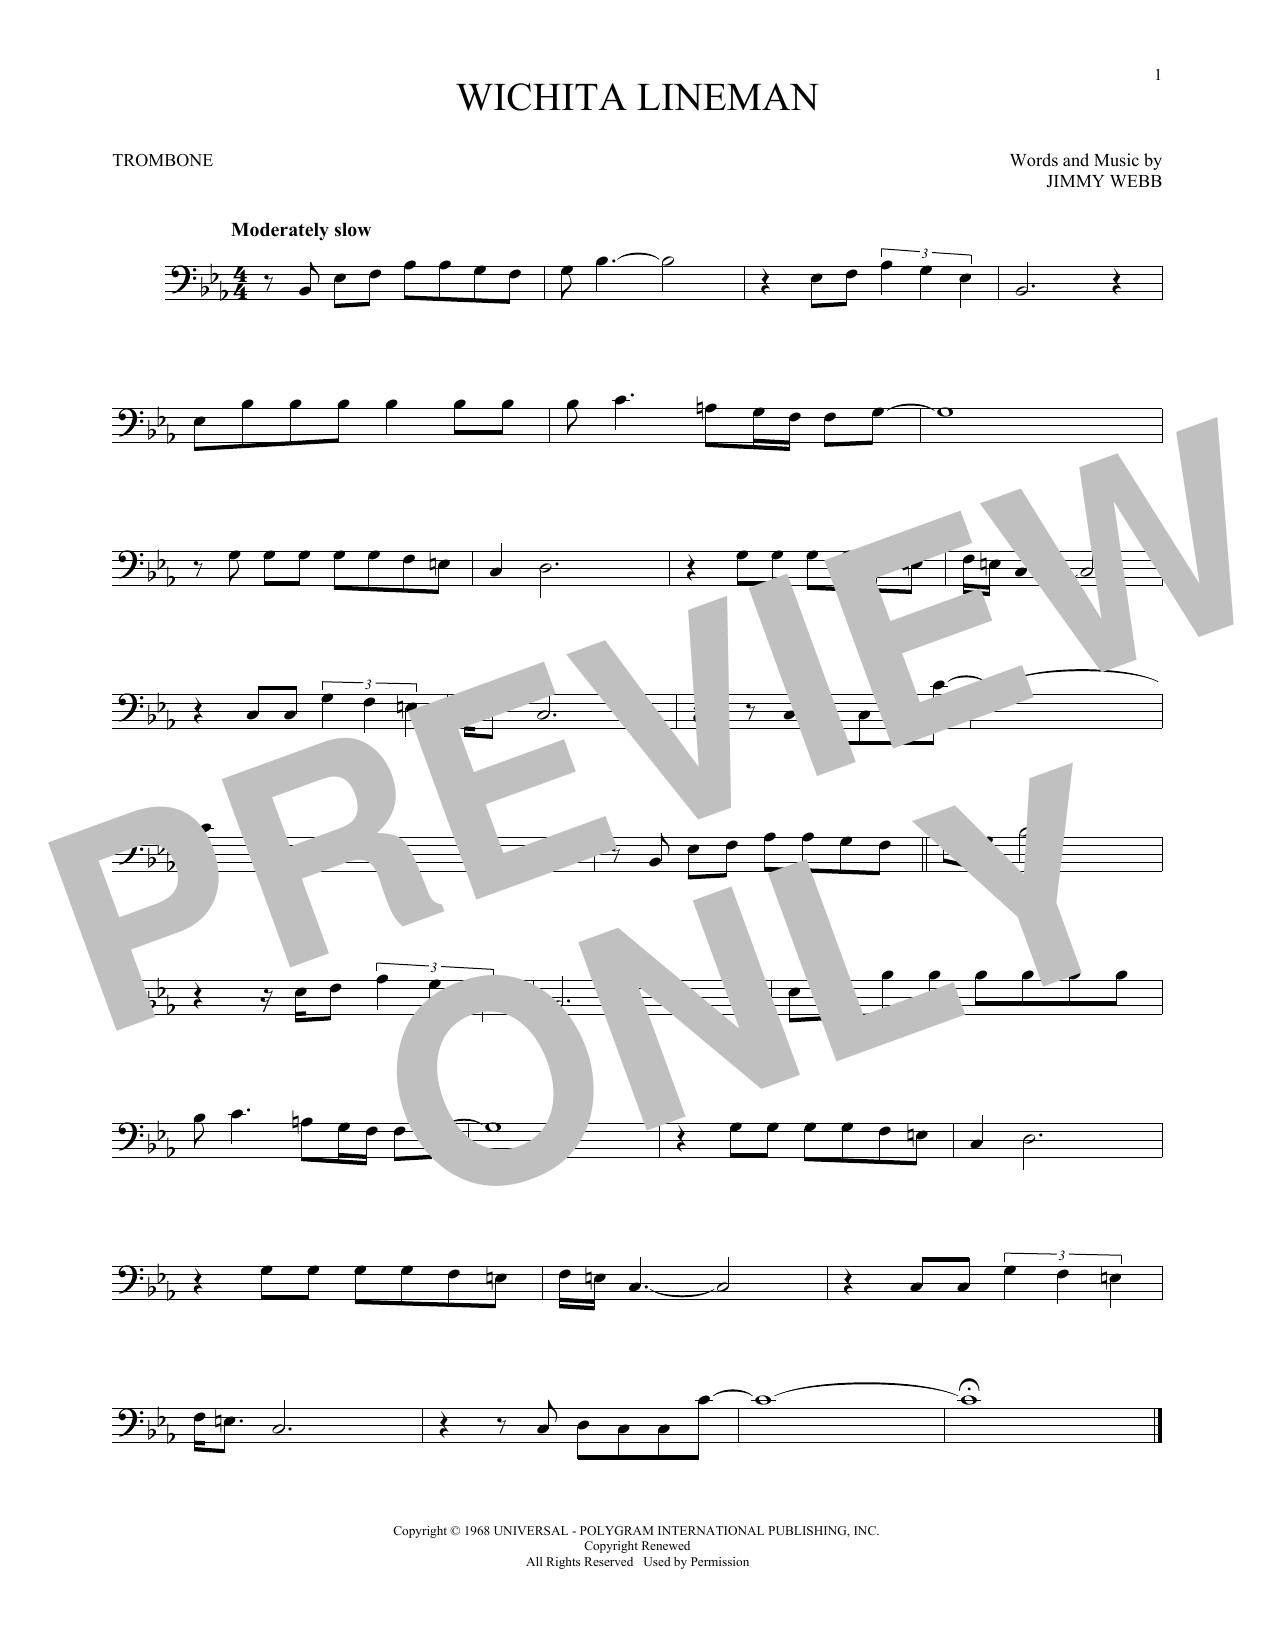 Wichita Lineman (Trombone Solo)